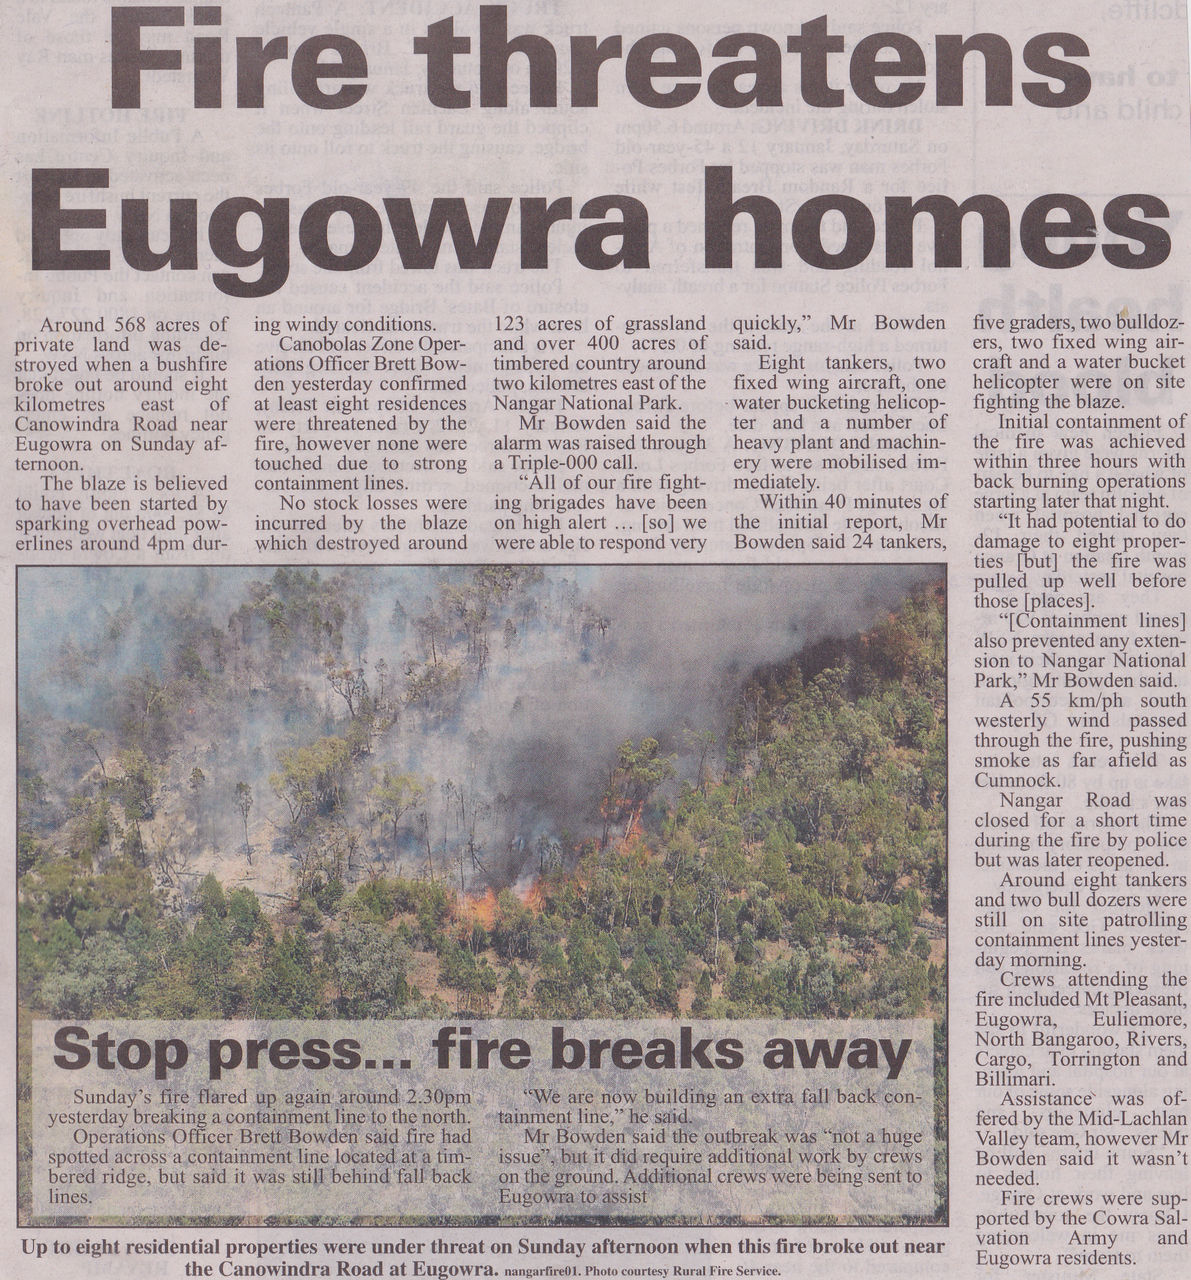 Fire threatens Eugowra homes